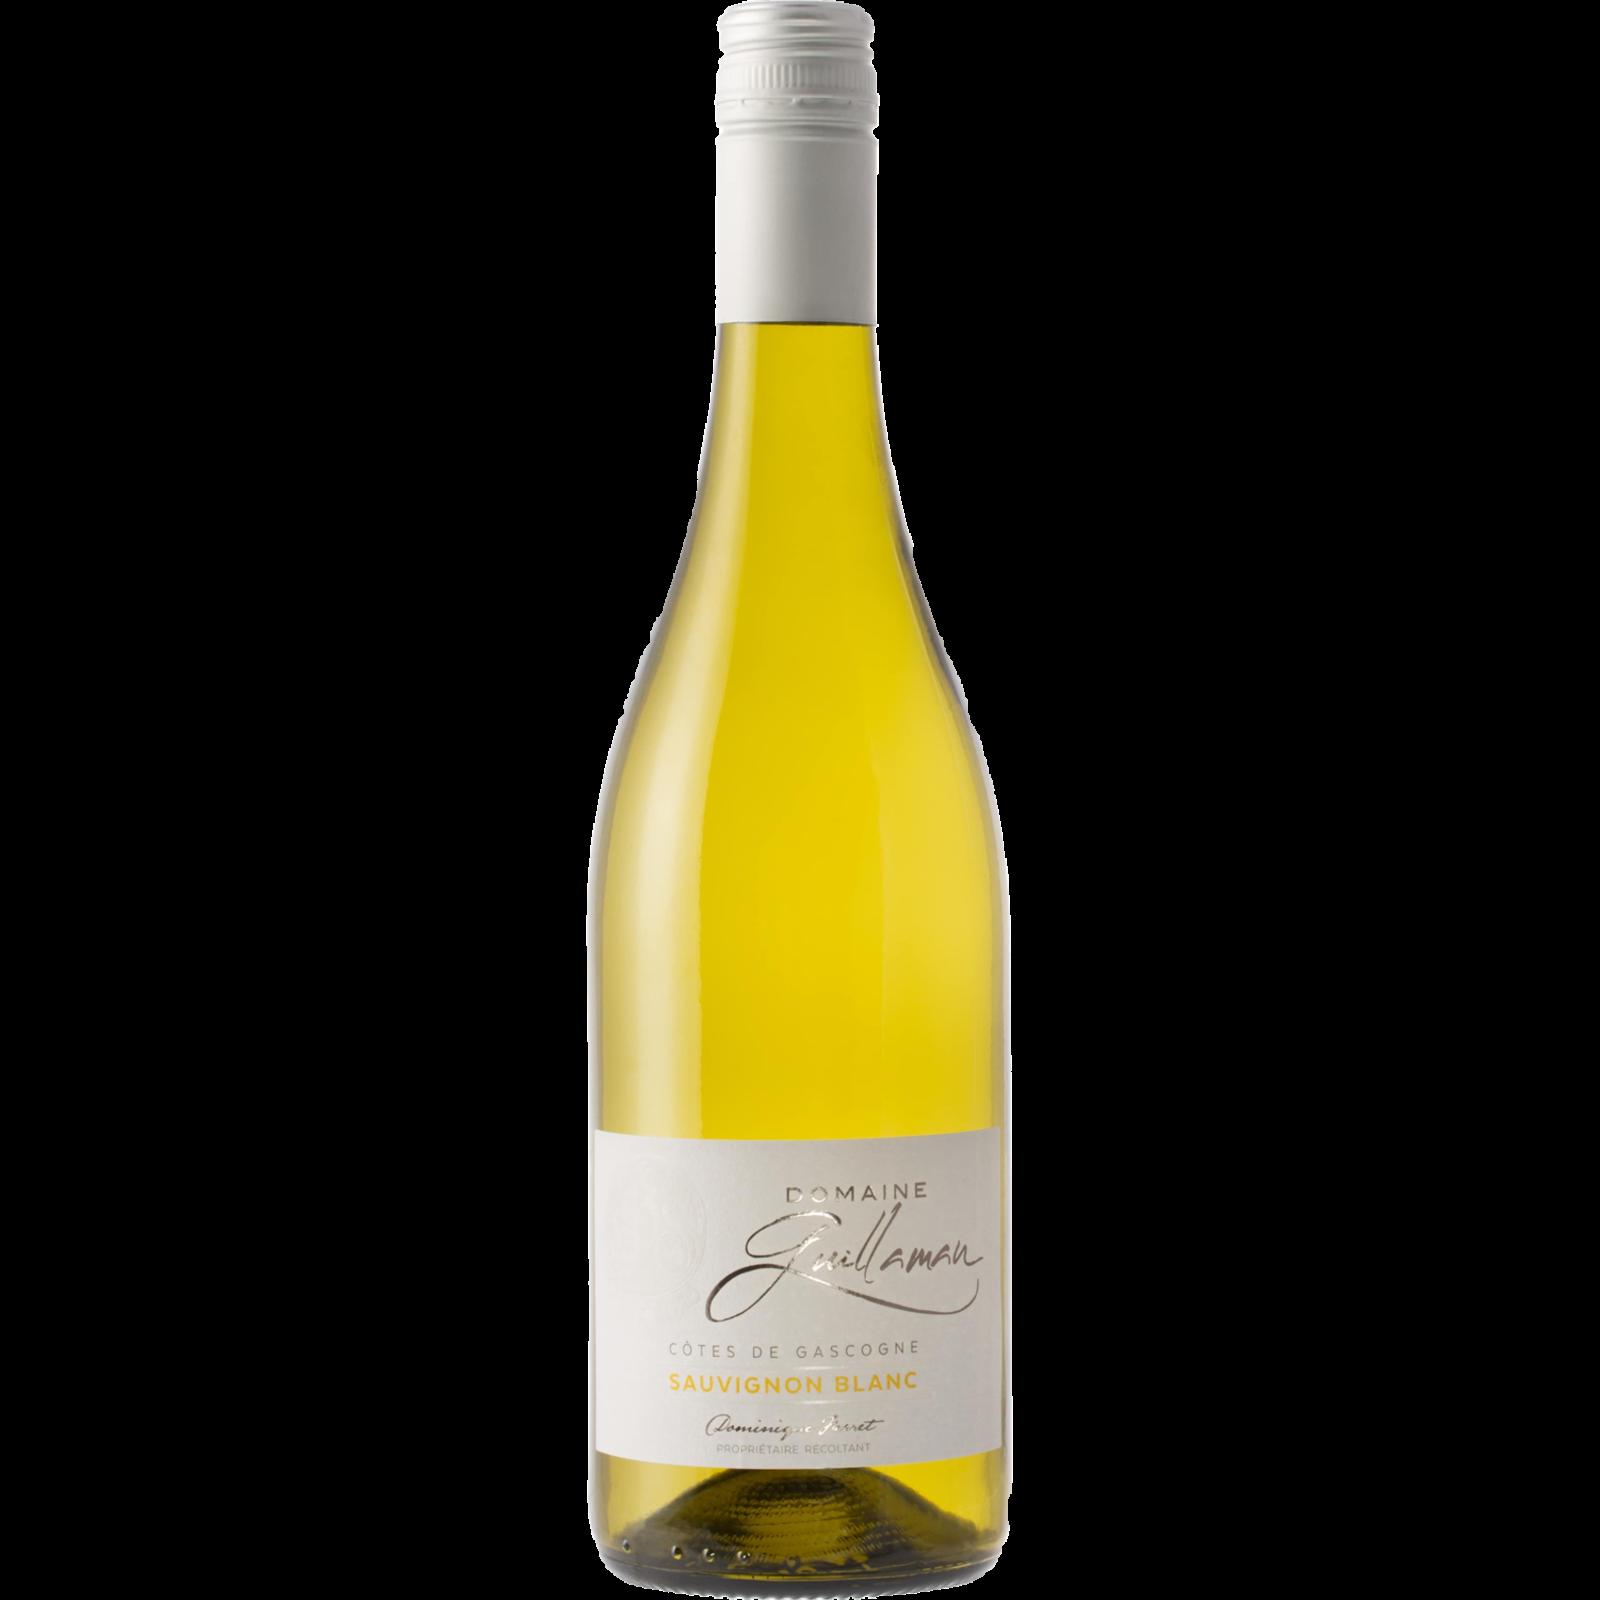 Domaine Guillaman Guillaman Sauvignon Blanc 2020